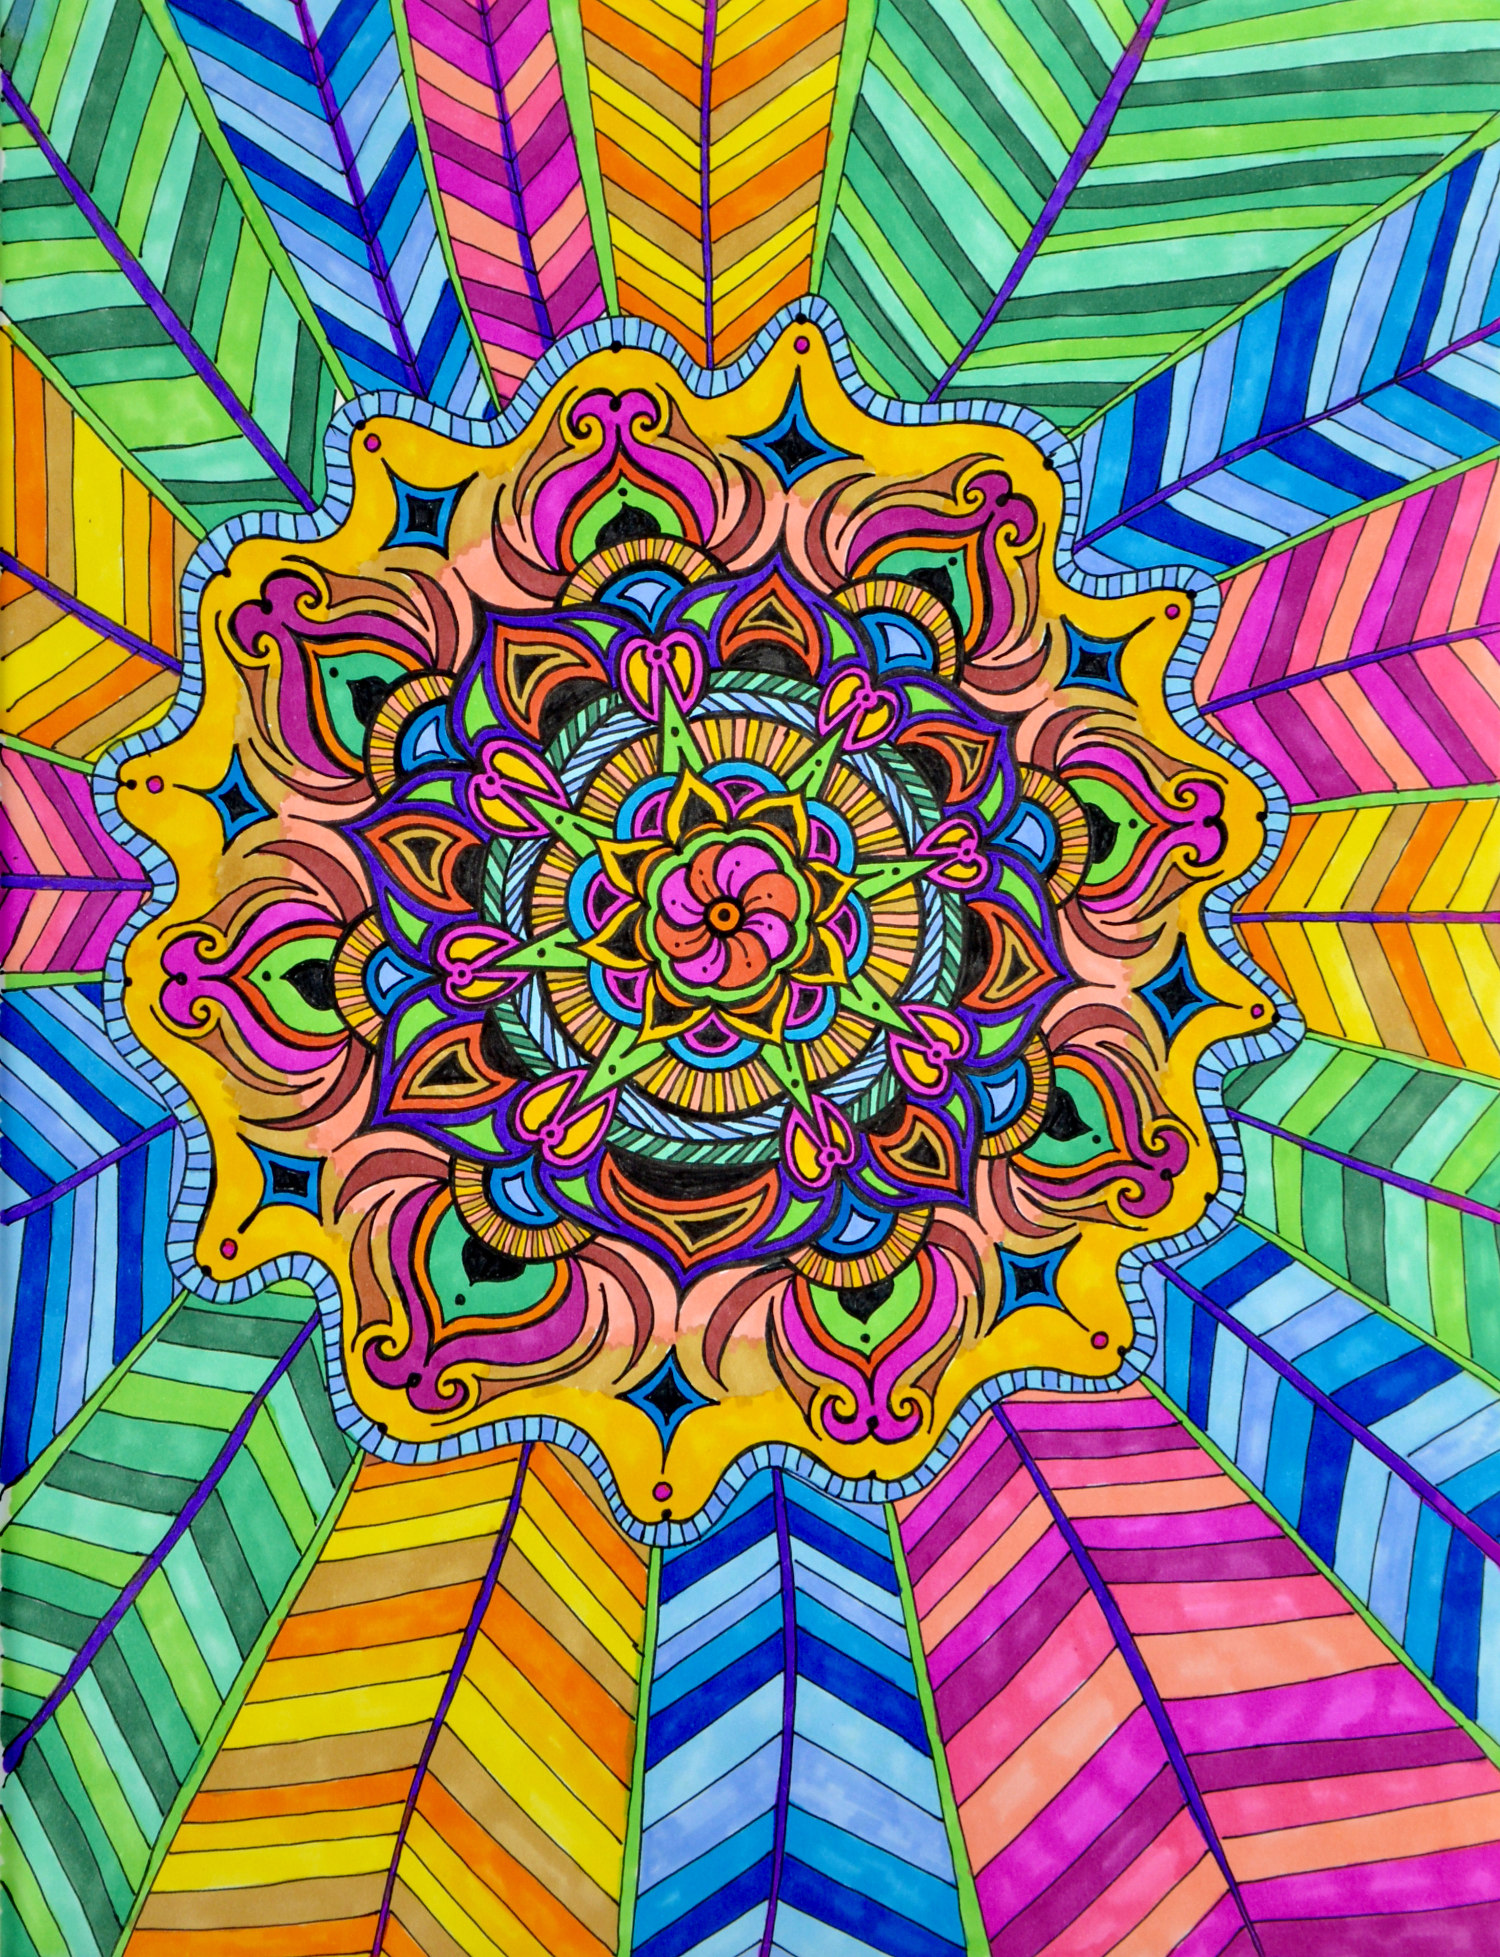 Flowers #3 drawing, by Tara Marolf